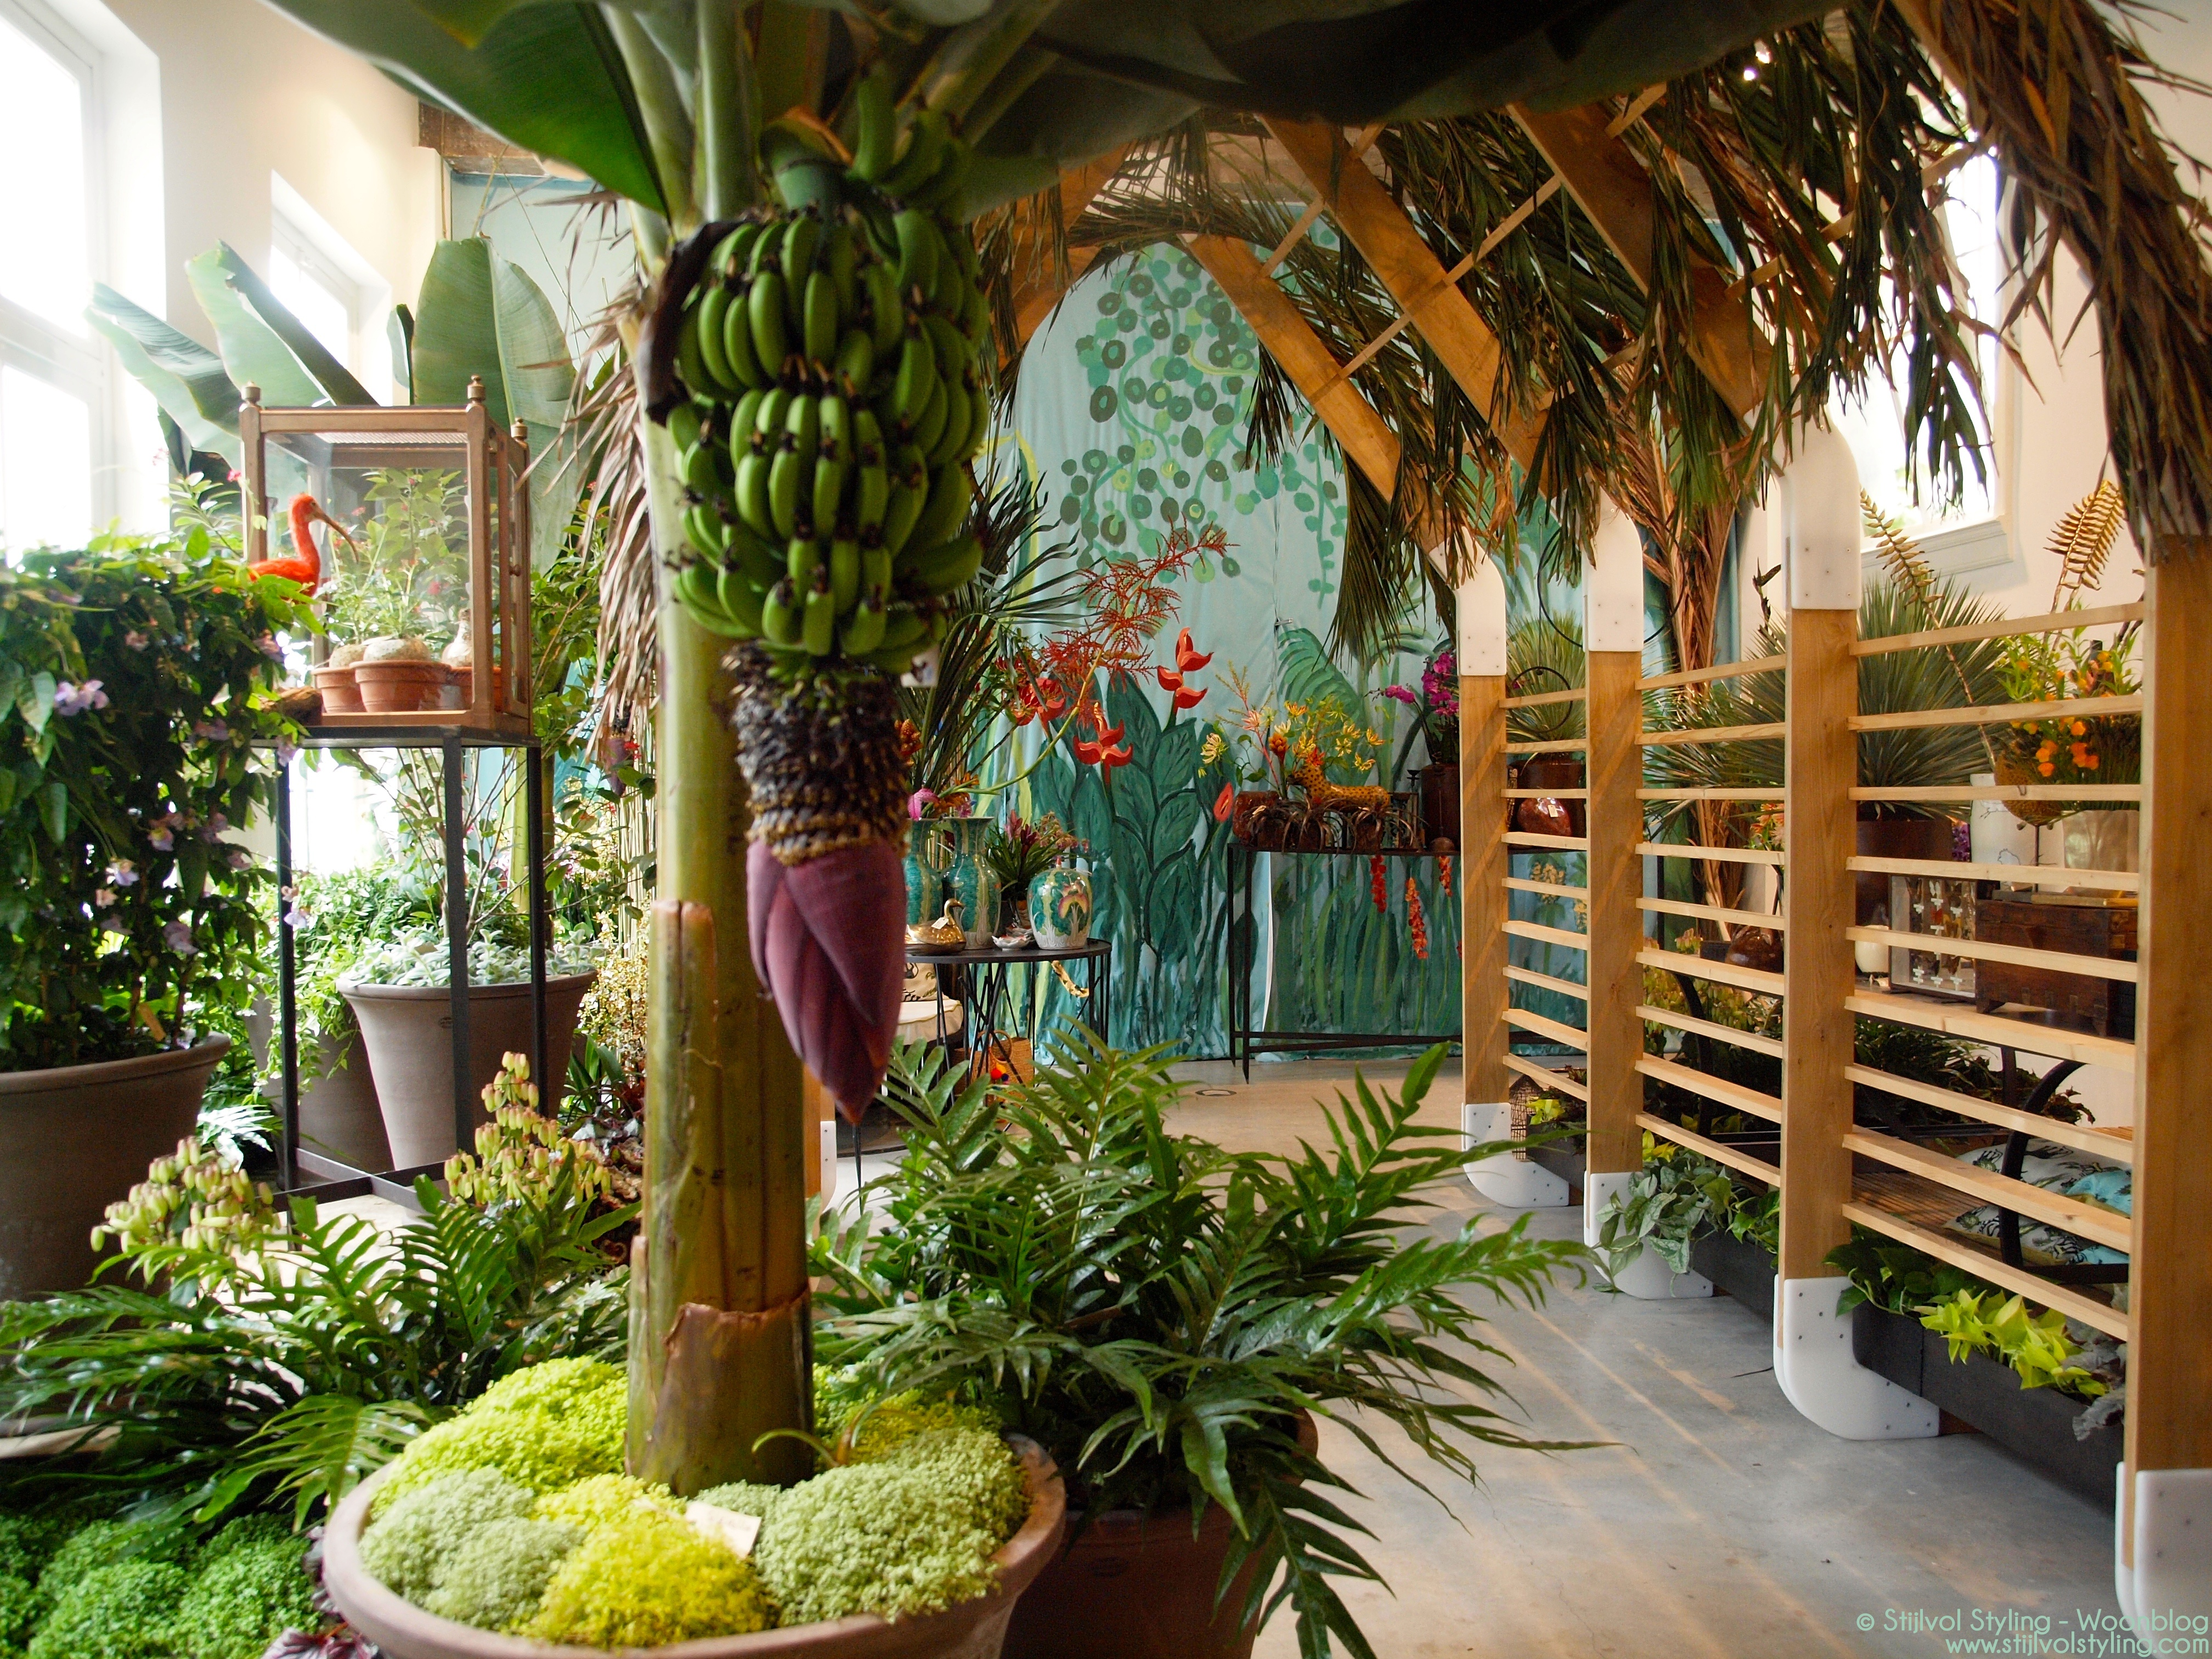 The Wunderkammer - Shop for a Week - Stijlvol Mama blog www.stijlvolmamablog.nl